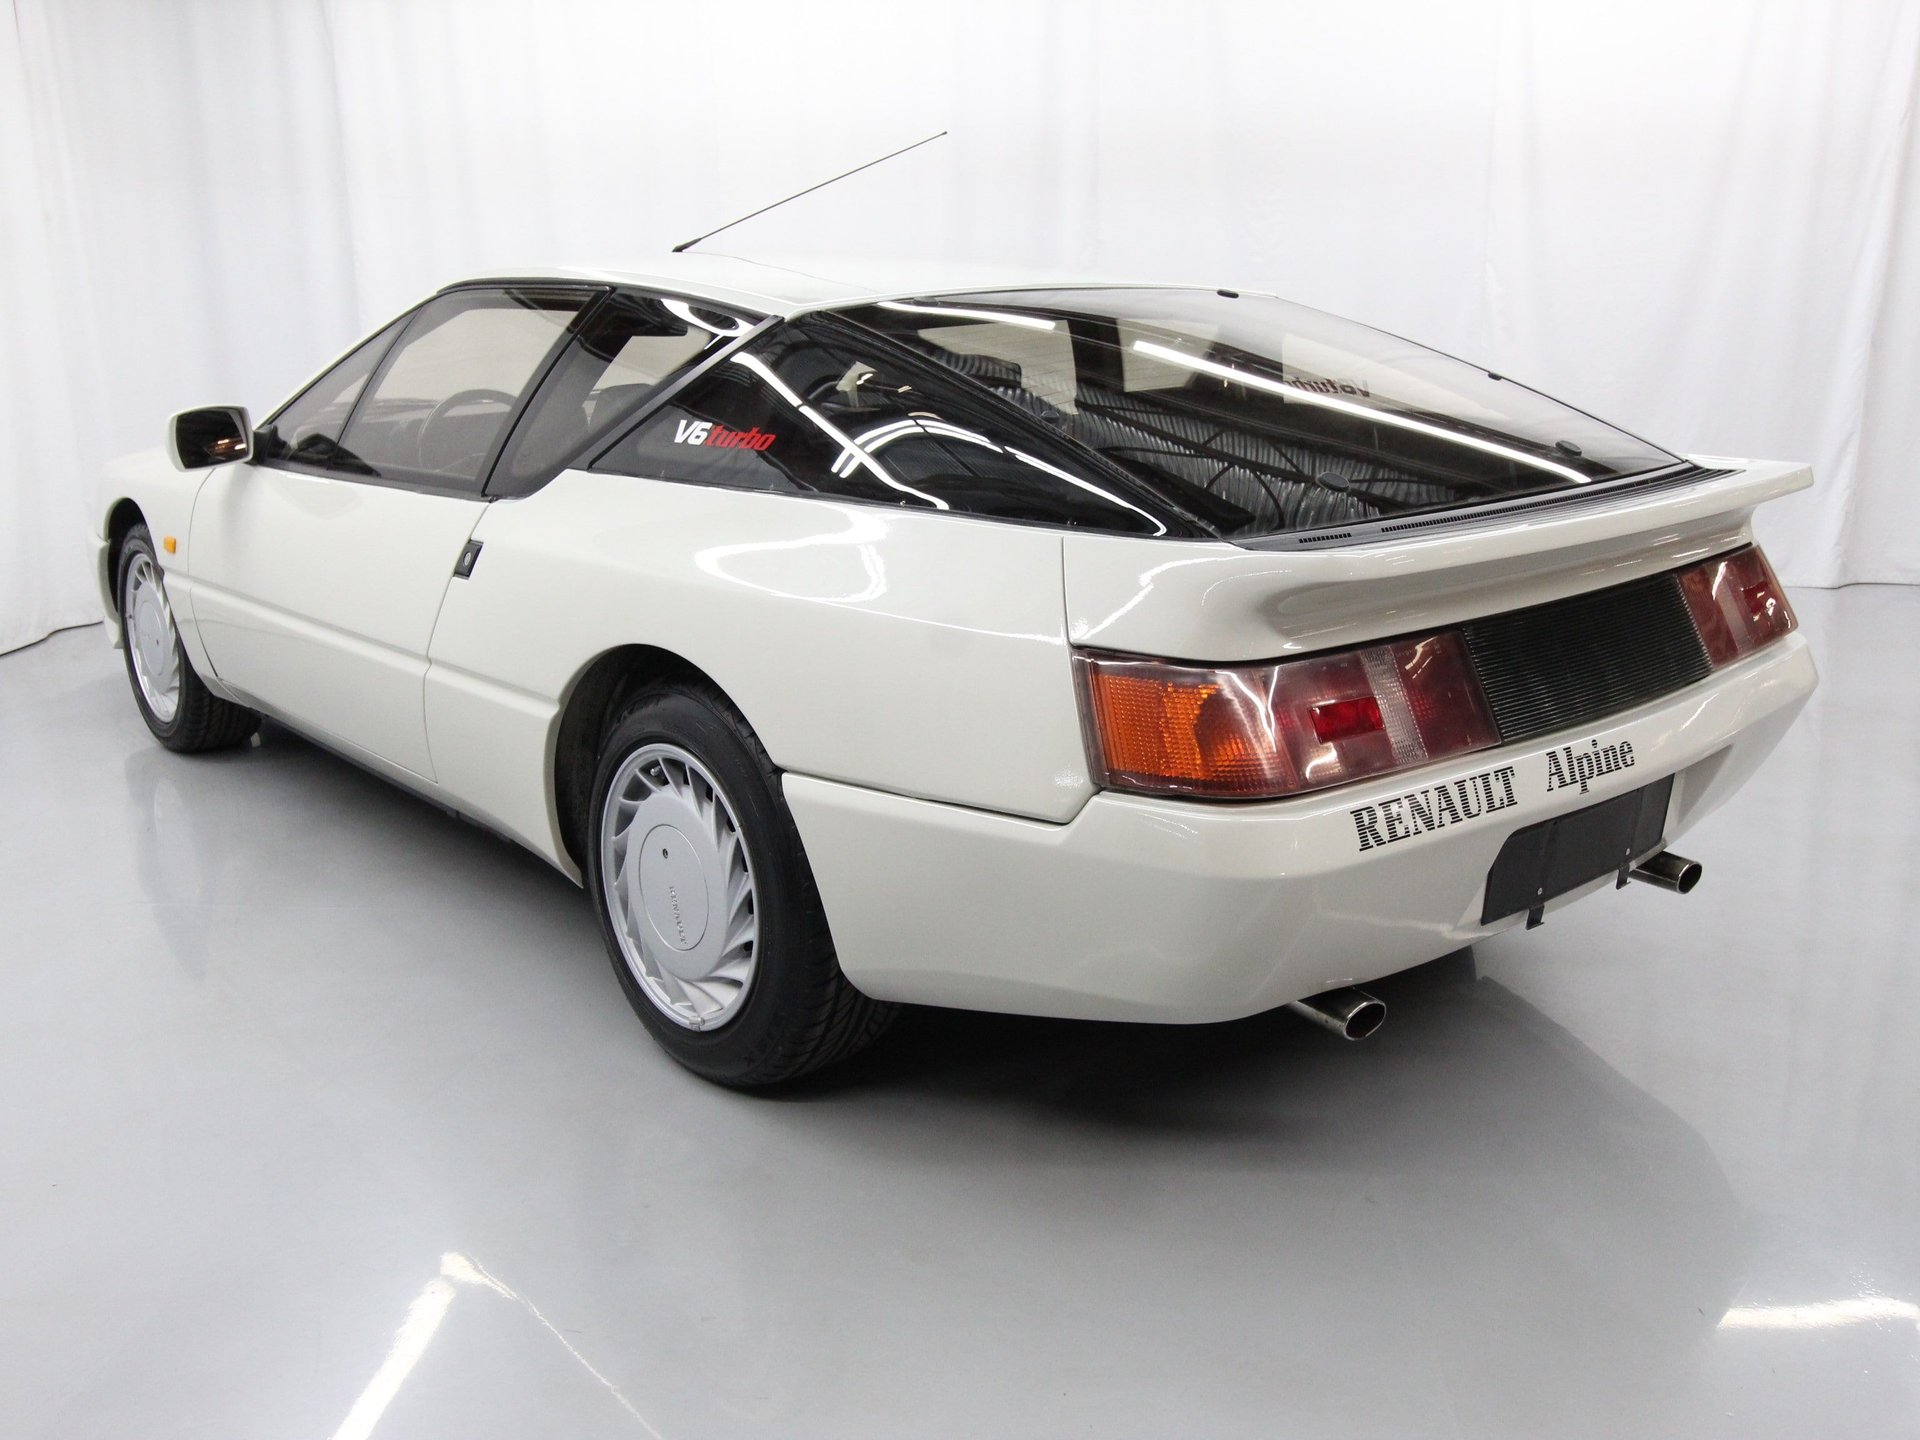 1989 Renault Alpine